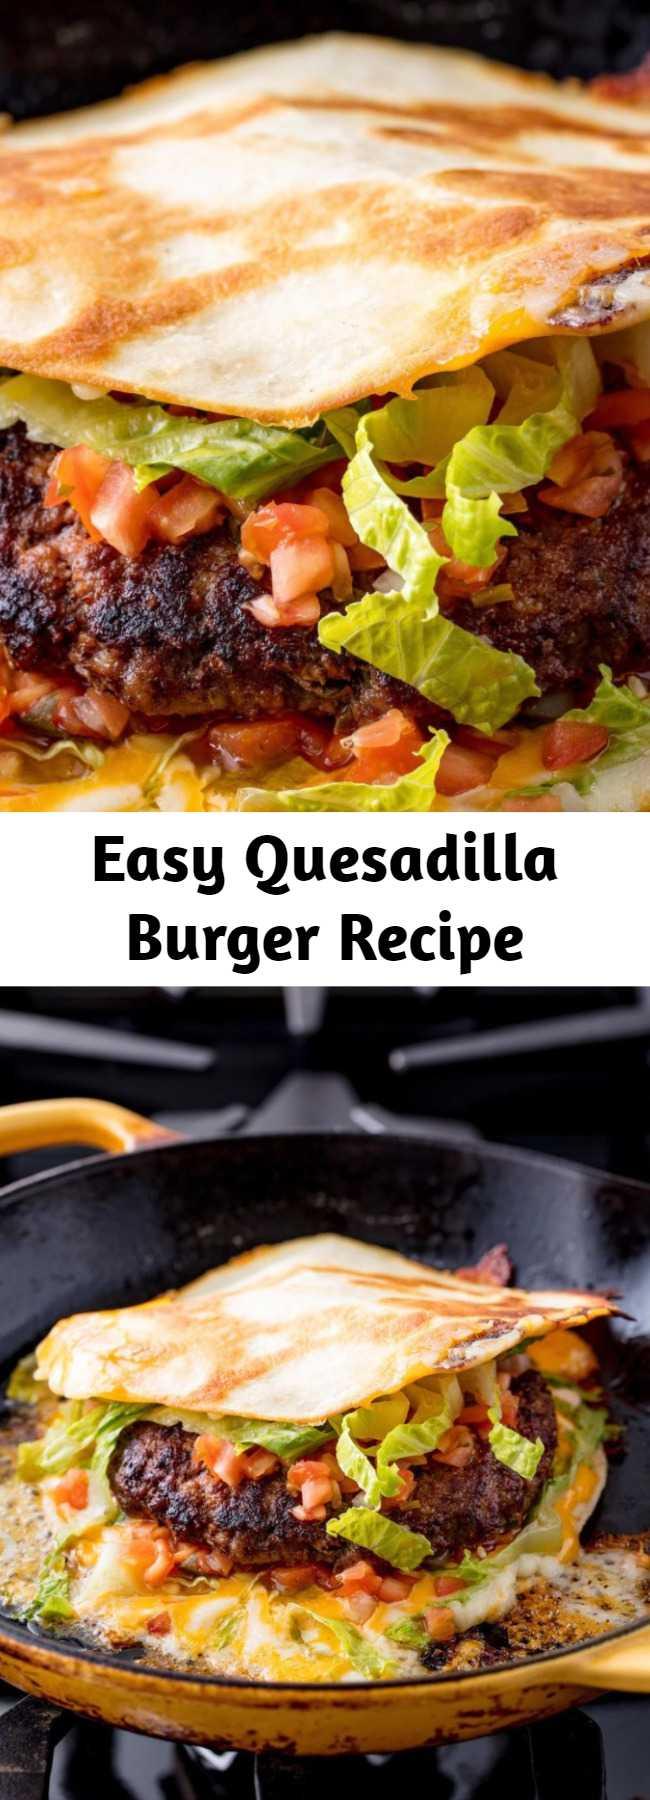 Easy Quesadilla Burger Recipe - No longer do you have to choose between a quesadilla or a burger.